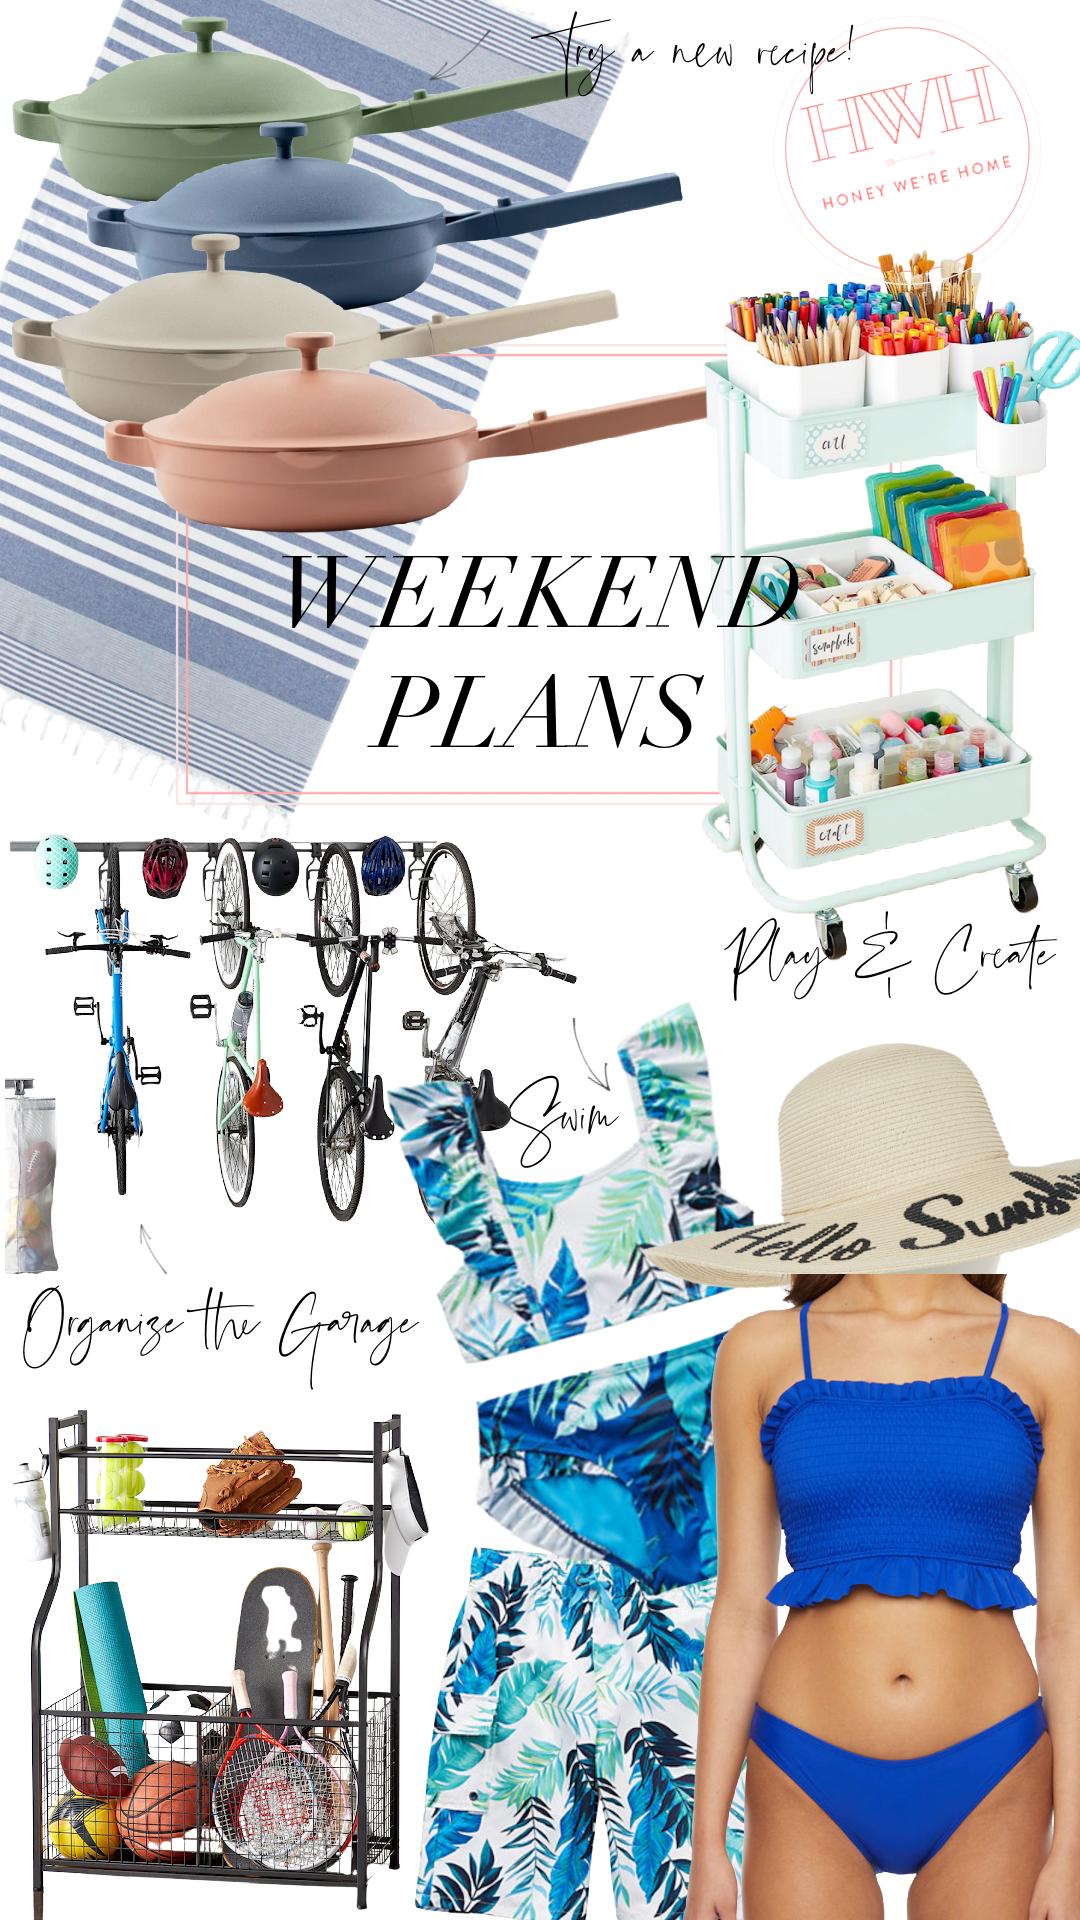 Long Weekend Plans | Cooking, Swimming, Organizing